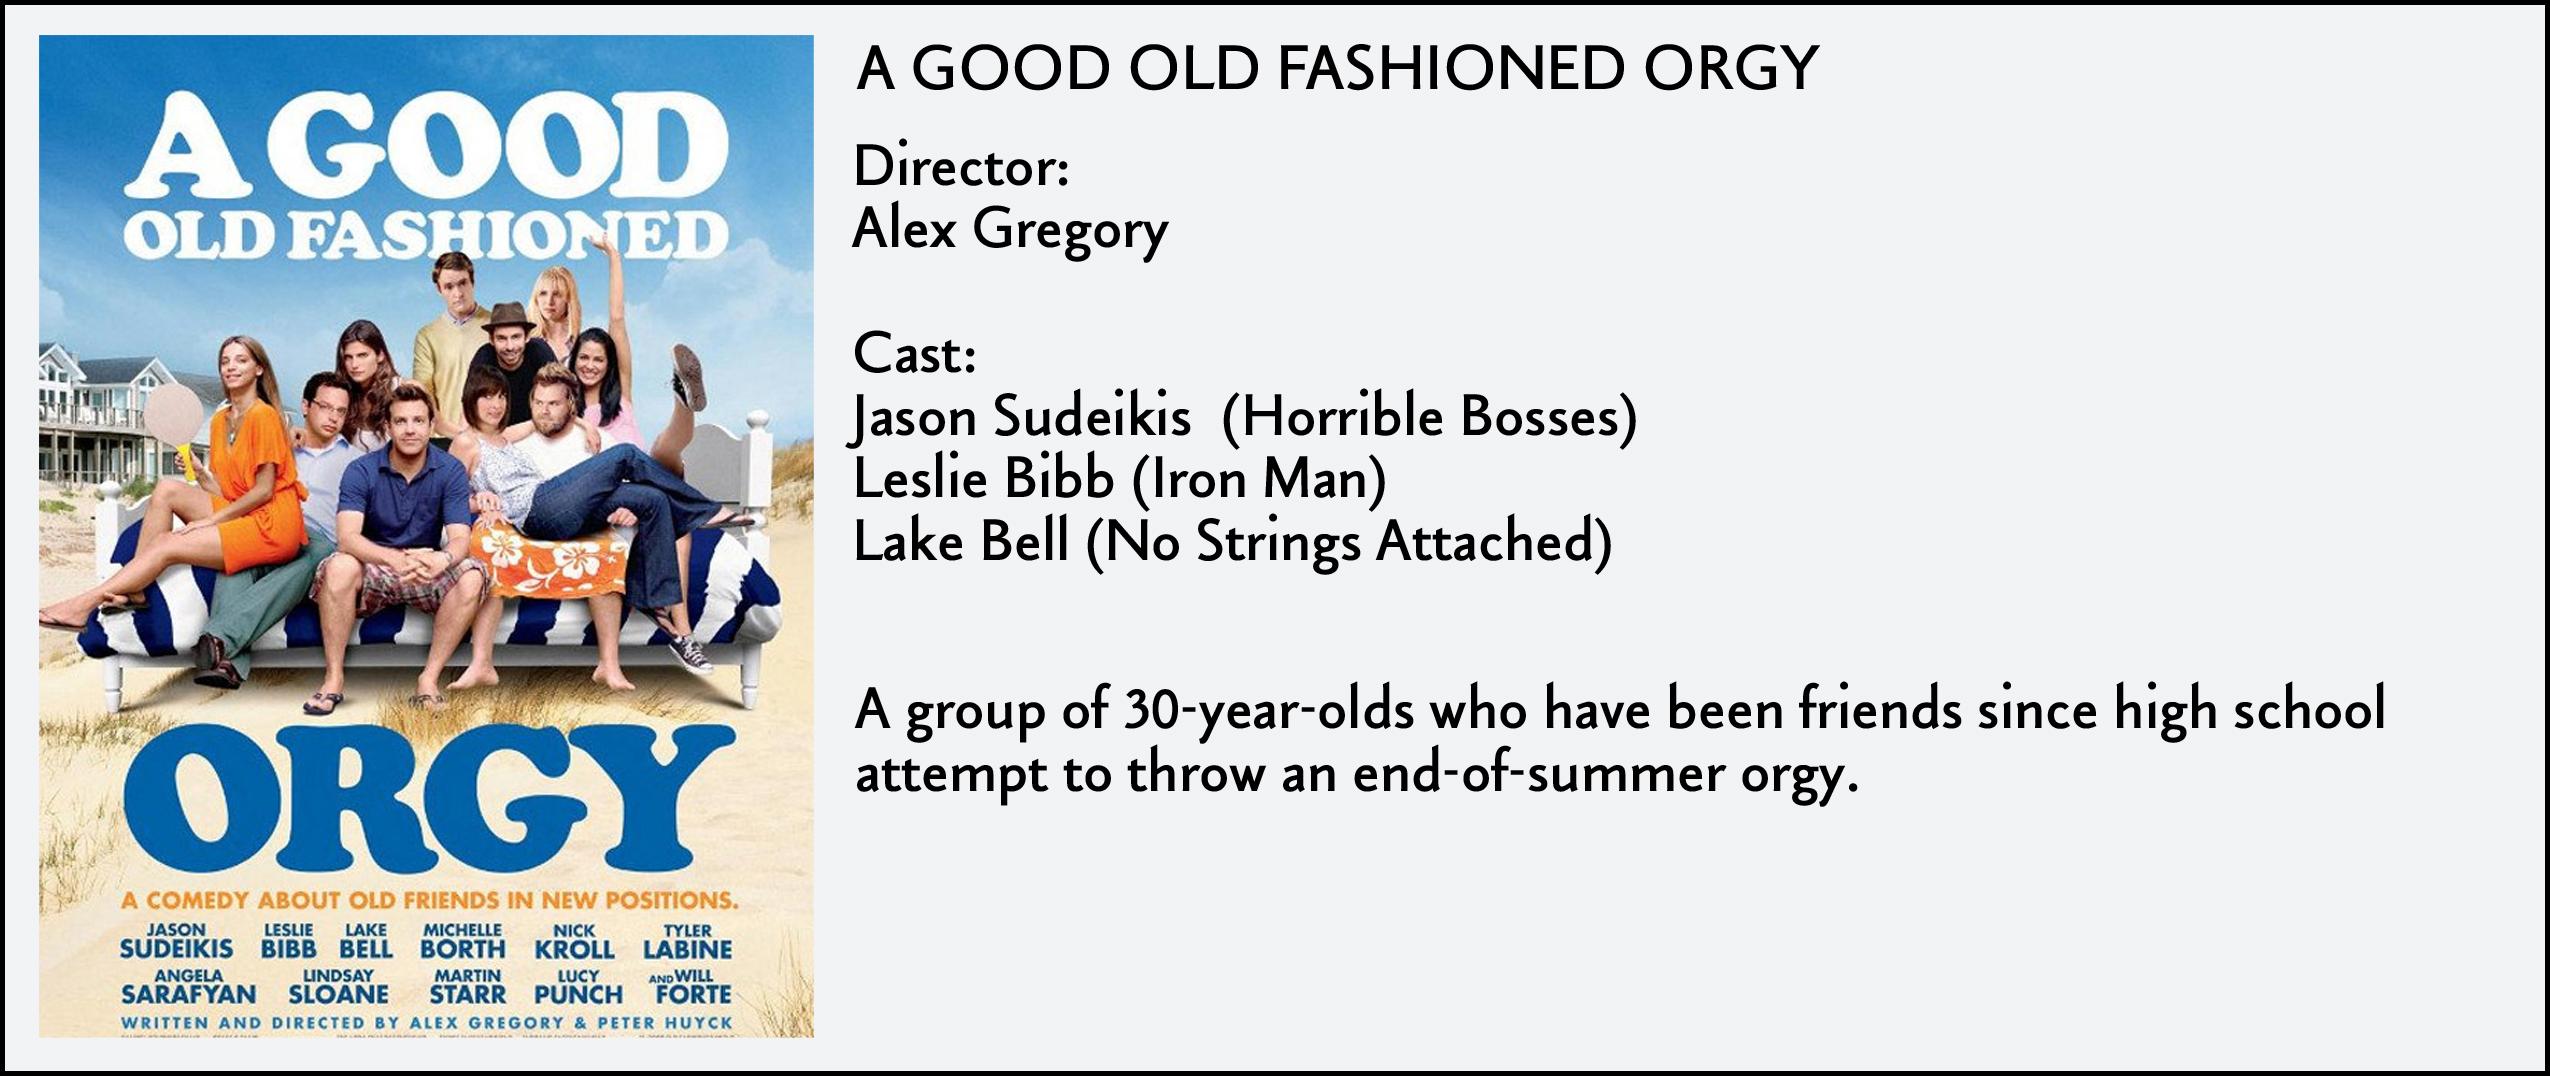 Good All Fashion Orgy